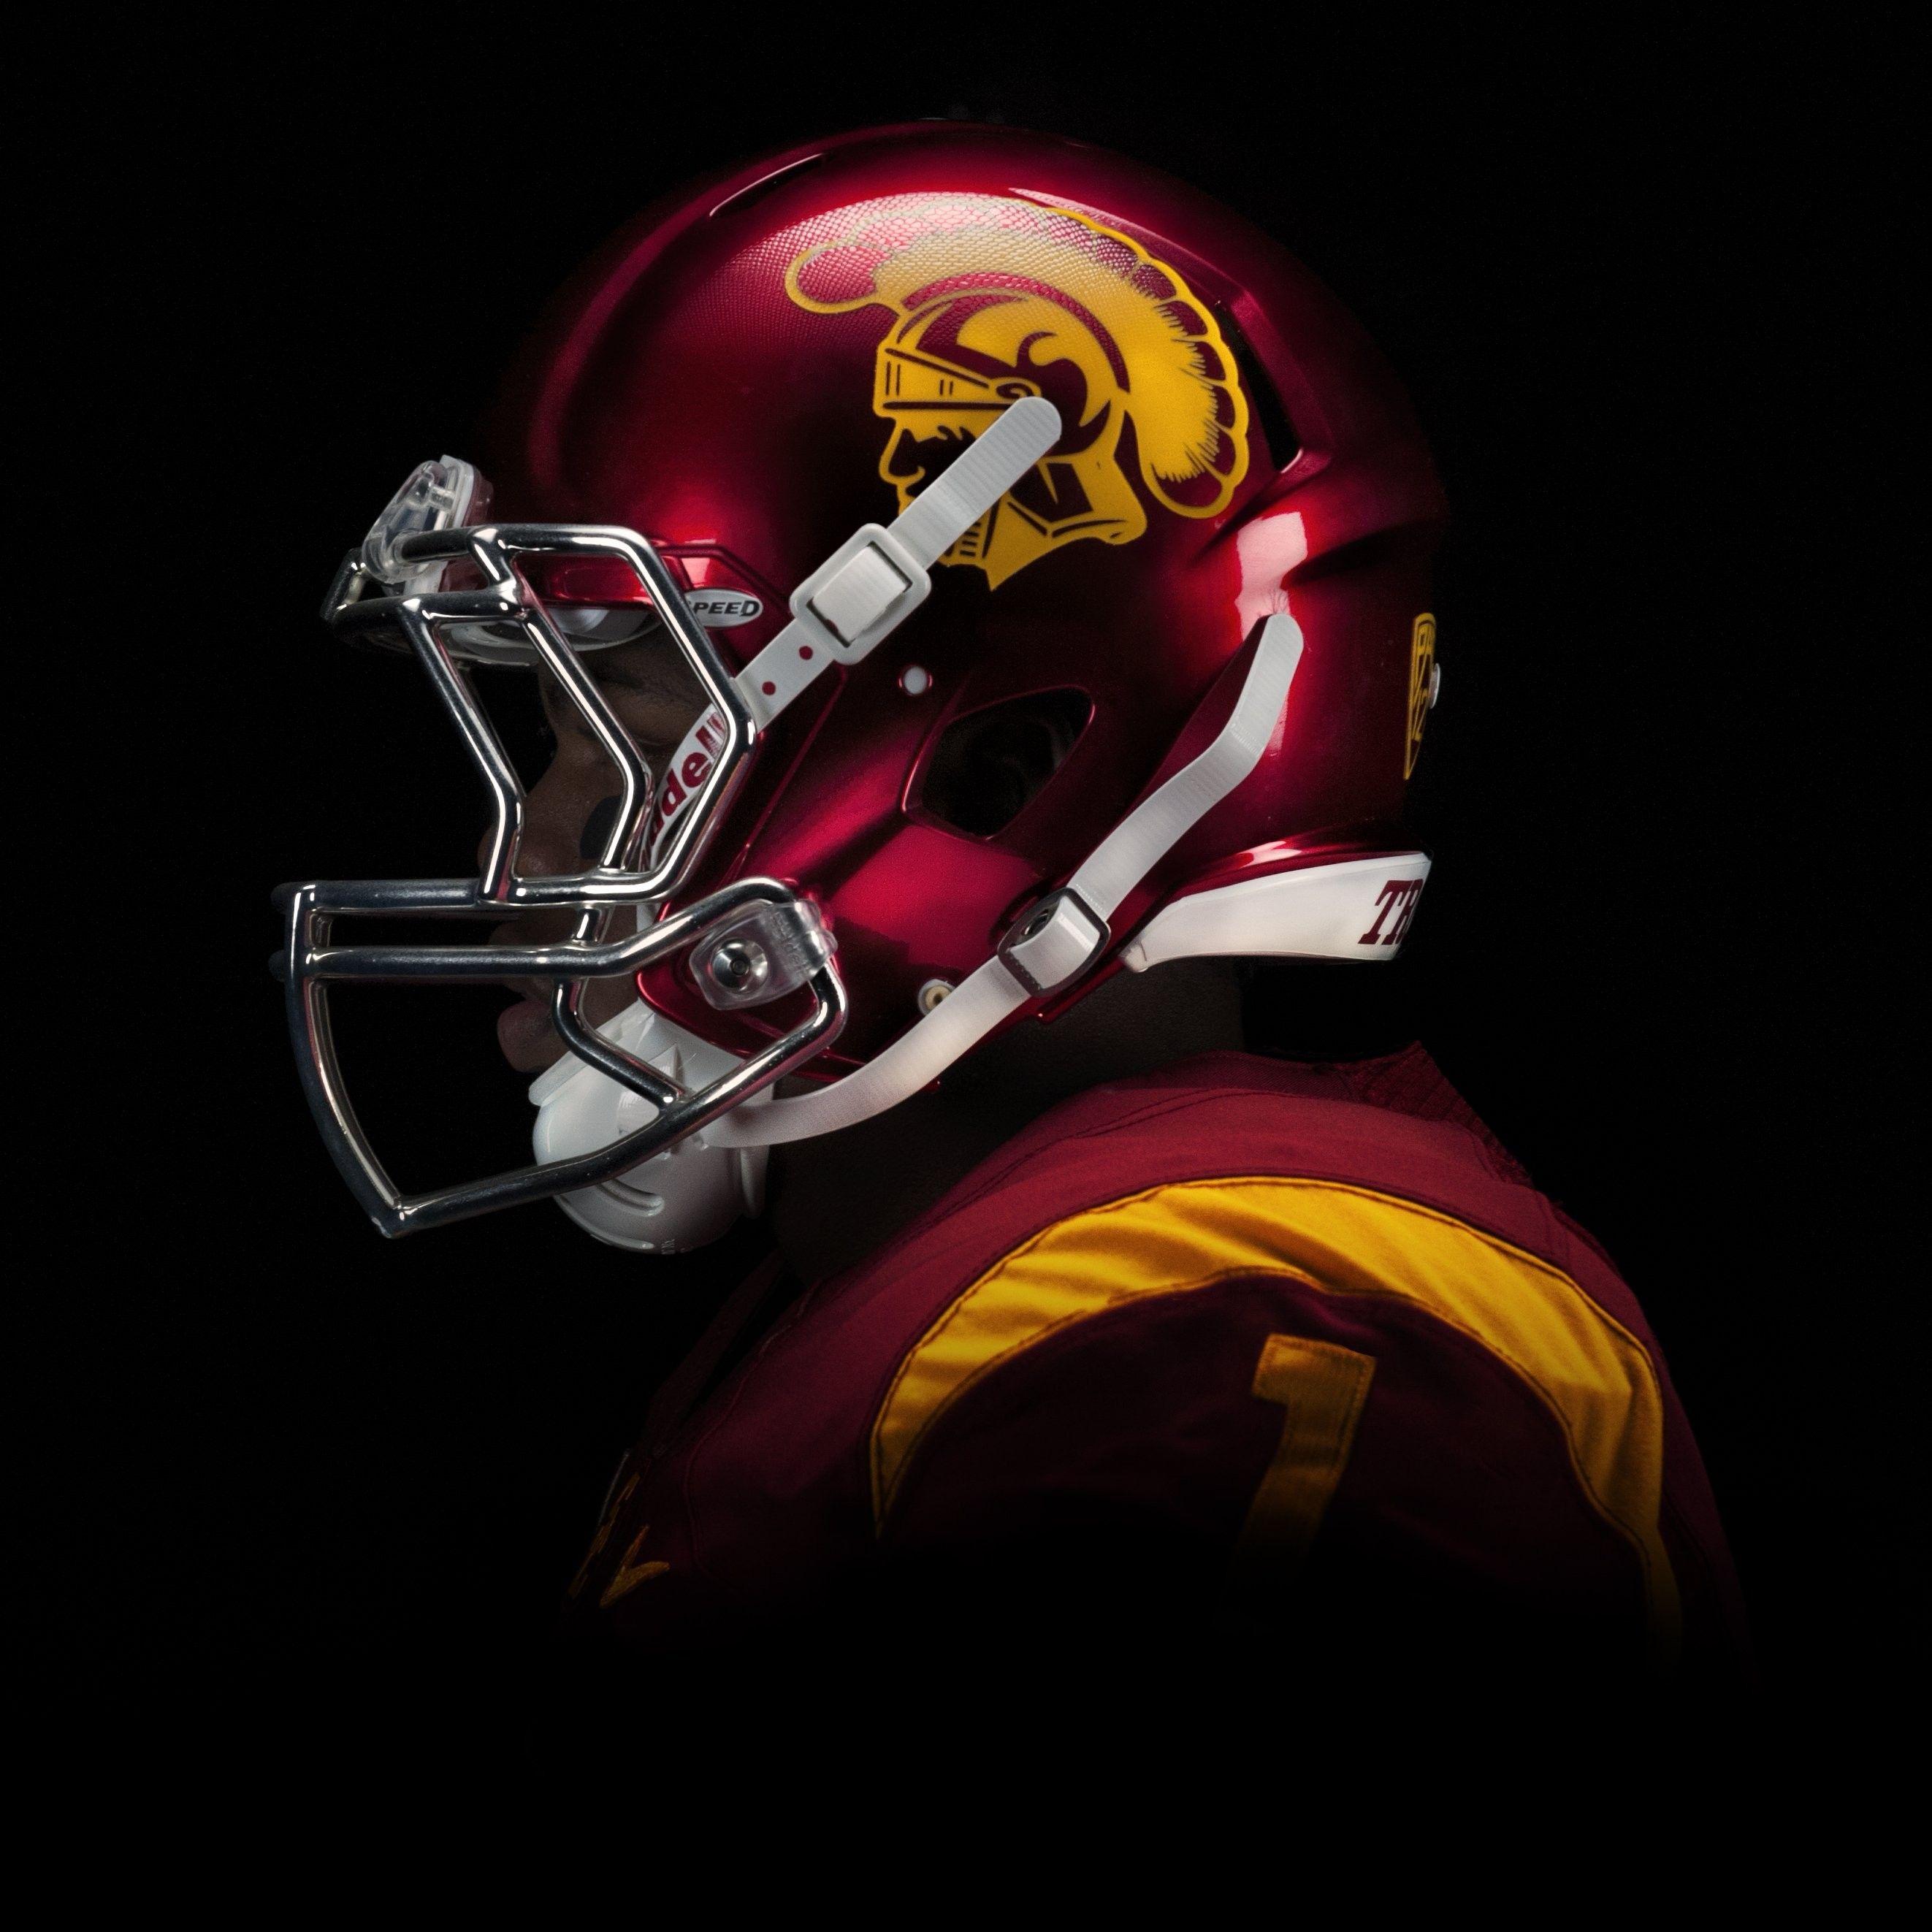 Unique Usc Trojans Football Wallpaper In 2020 Usc Trojans Football Helmet Usc Trojans Football Trojans Football